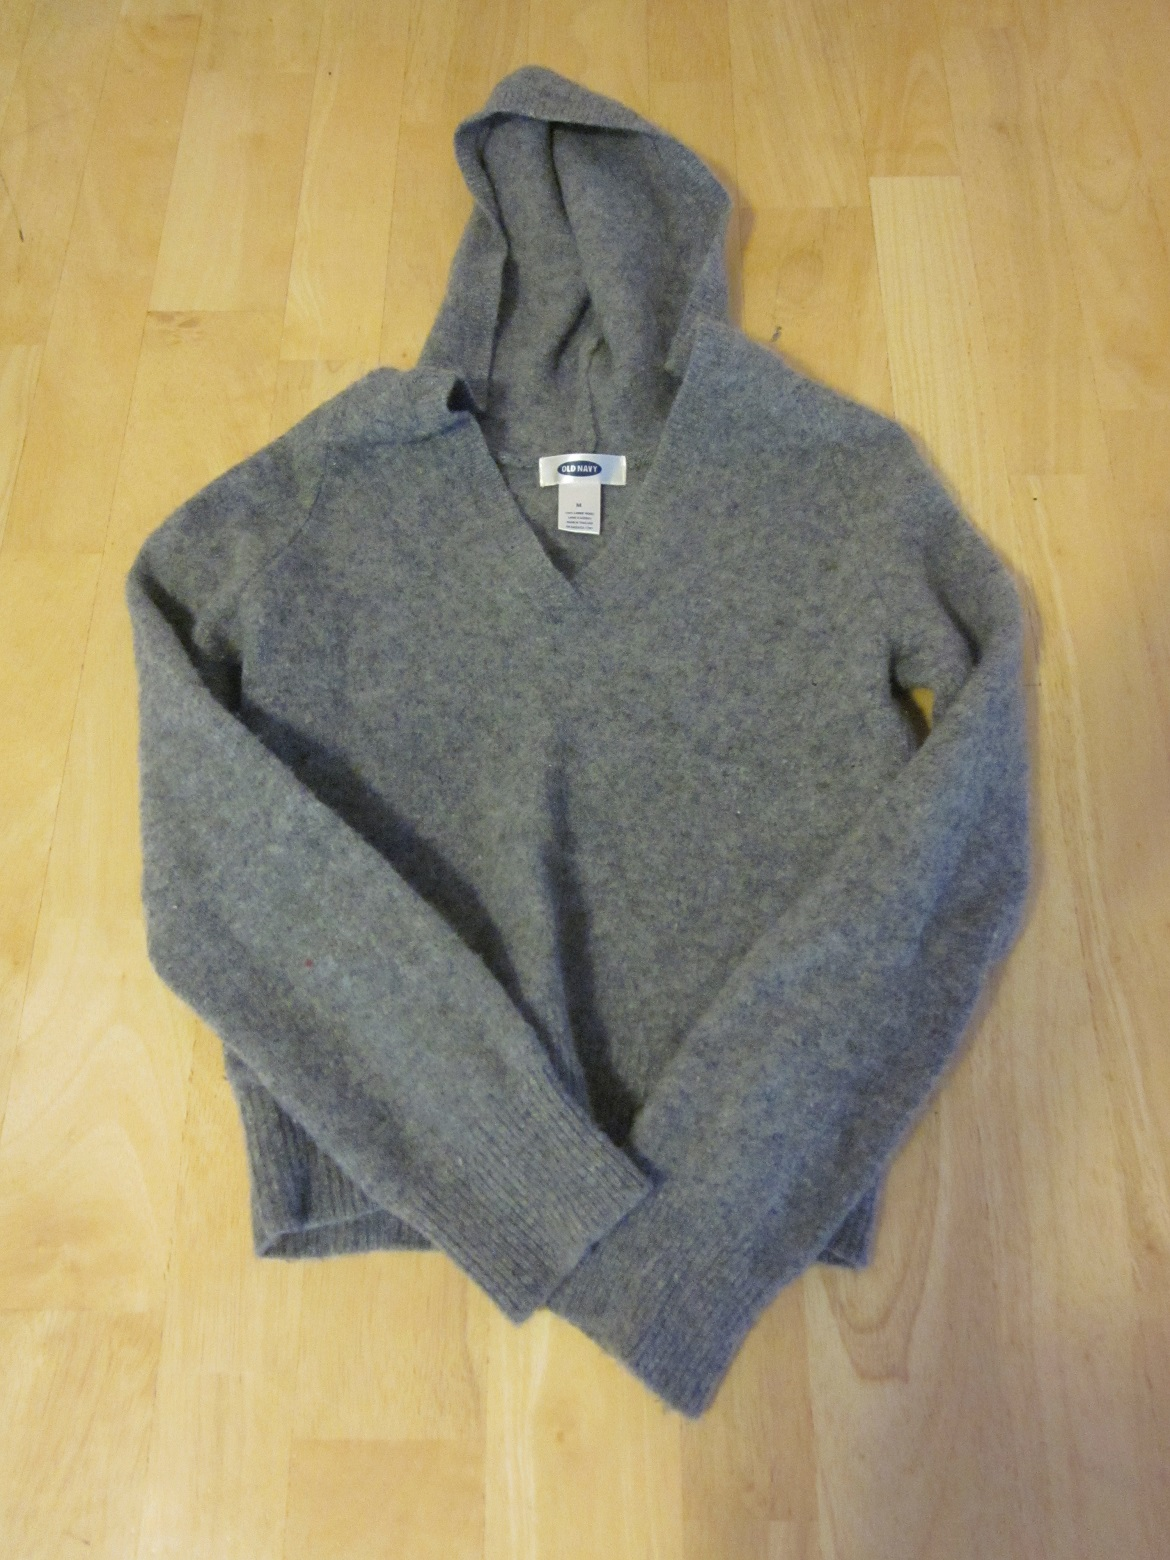 Old Navy Gray Hooded Sweater - Medium